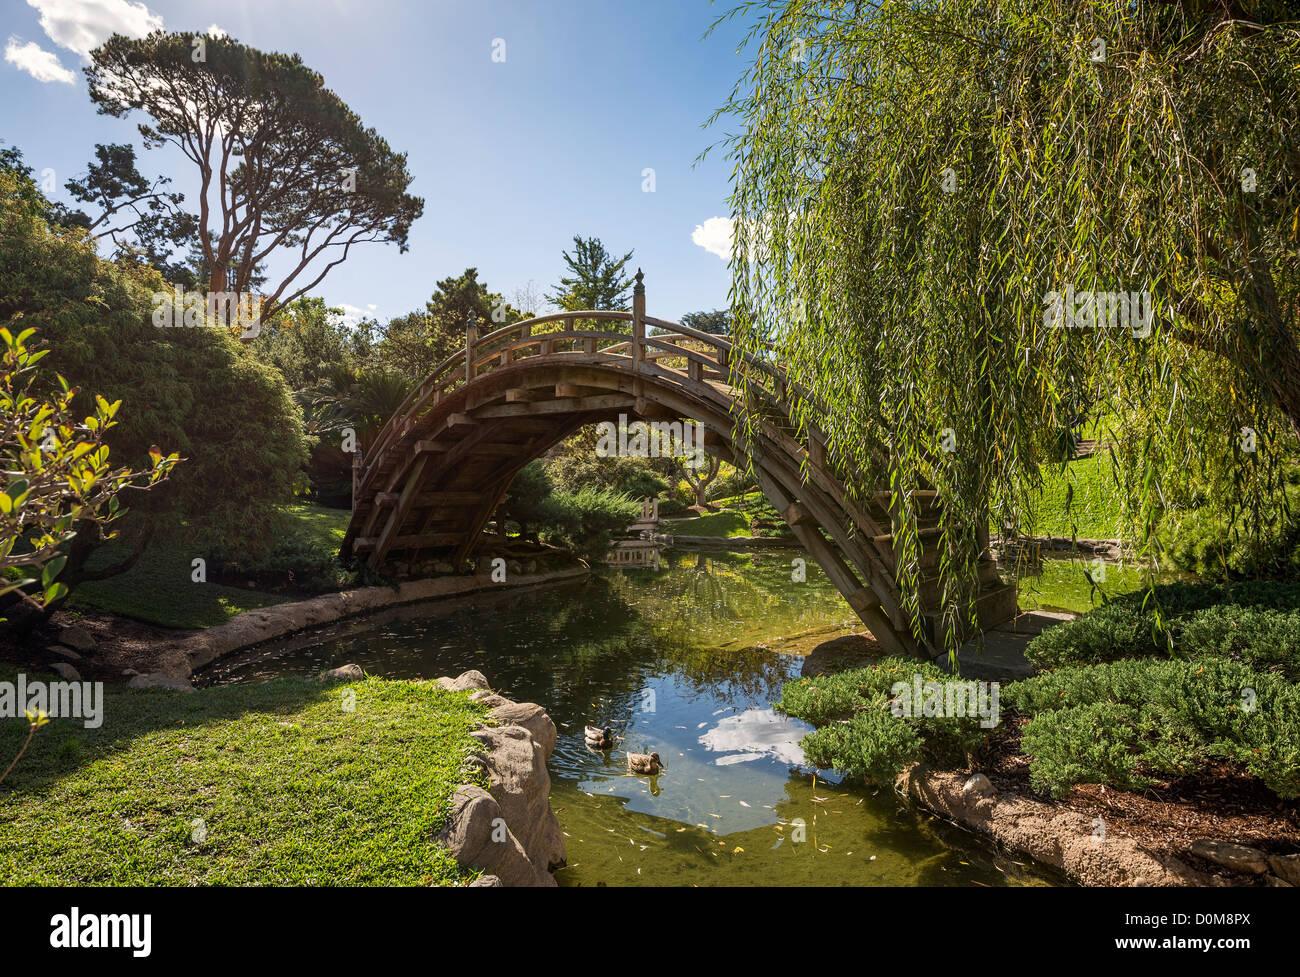 The beautifully renovated Japanese Gardens at the Huntington Library ...